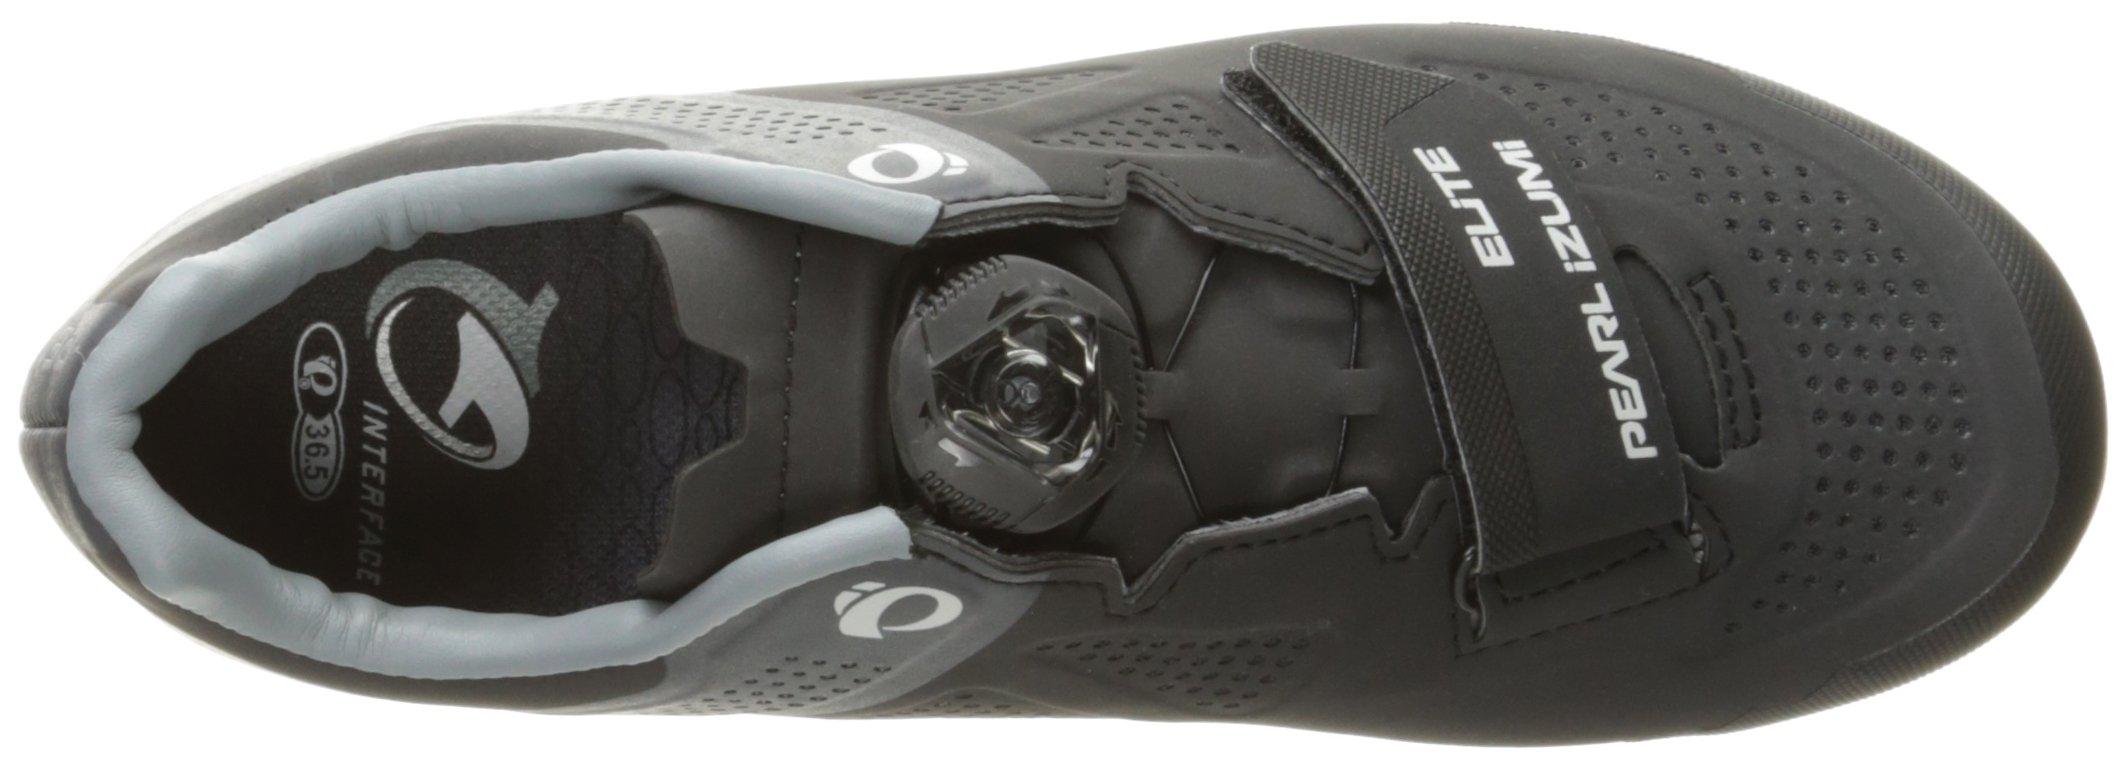 Pearl Izumi Women's w x-Project Elite Cycling Shoe, Black/Monument Grey, 40 EU/8.4 B US by Pearl iZUMi (Image #8)